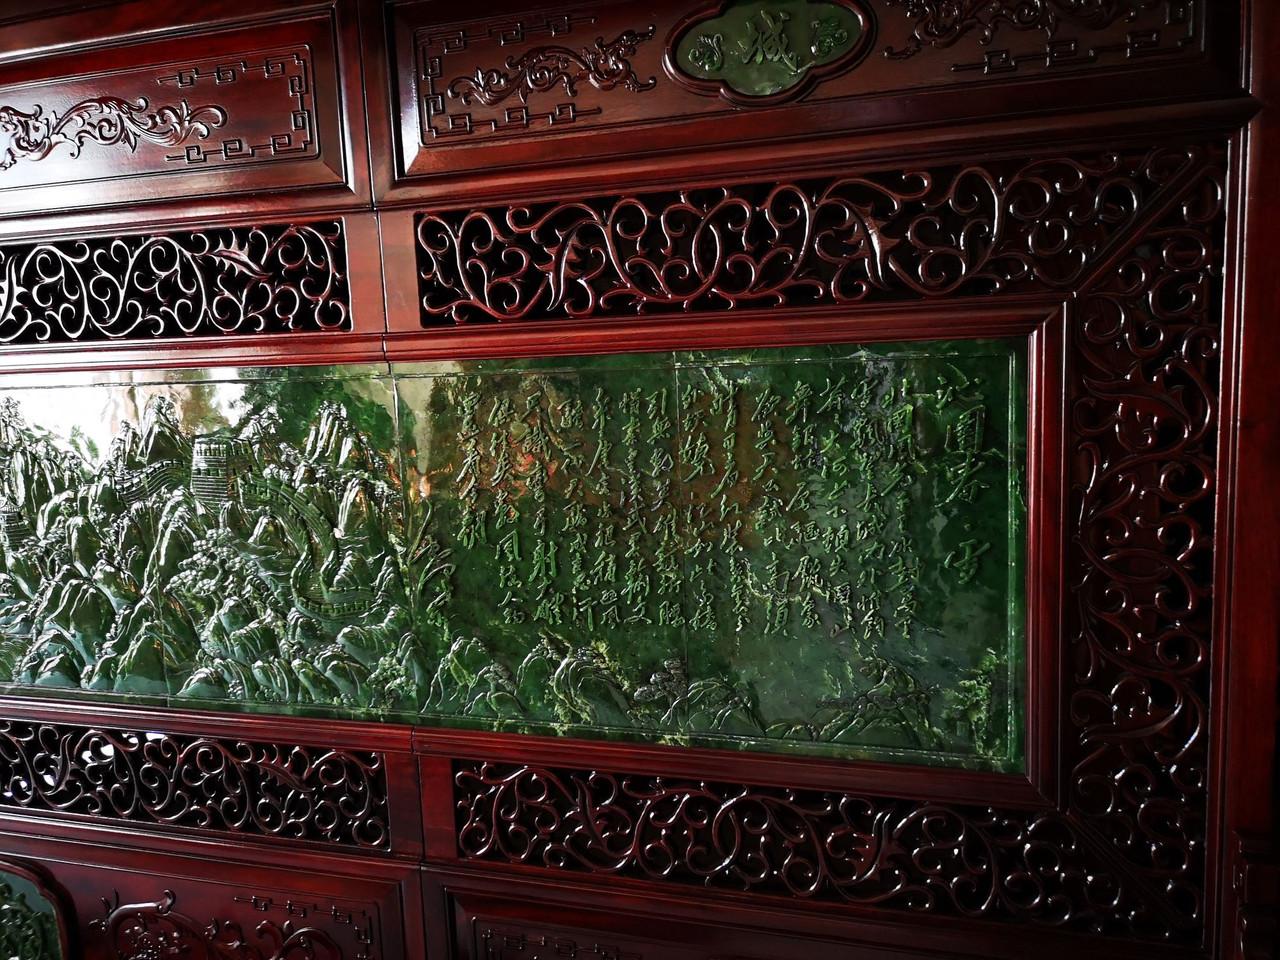 Green Jade The Great Wall